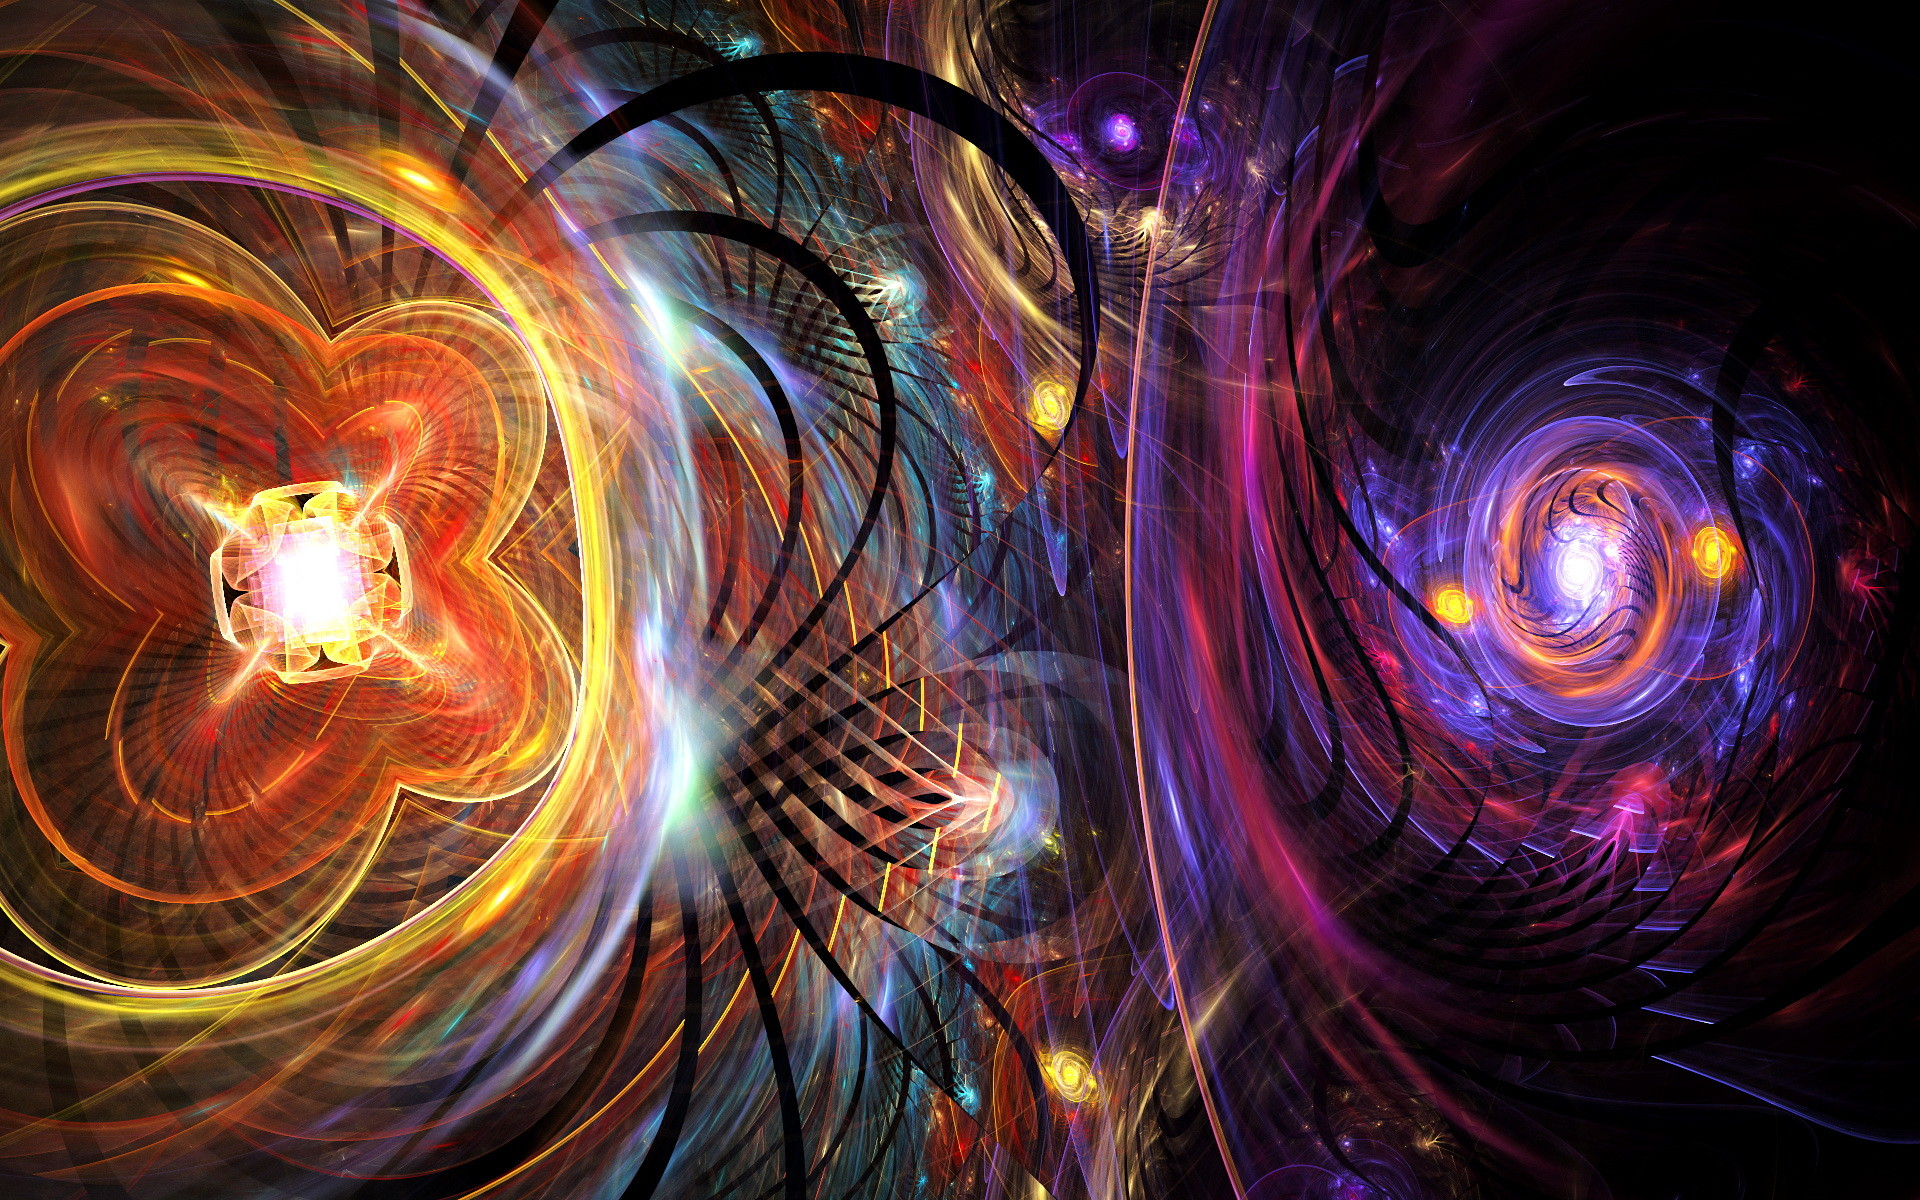 trippy wallpaper photo – https://69hdwallpapers.com/trippy-wallpaper-